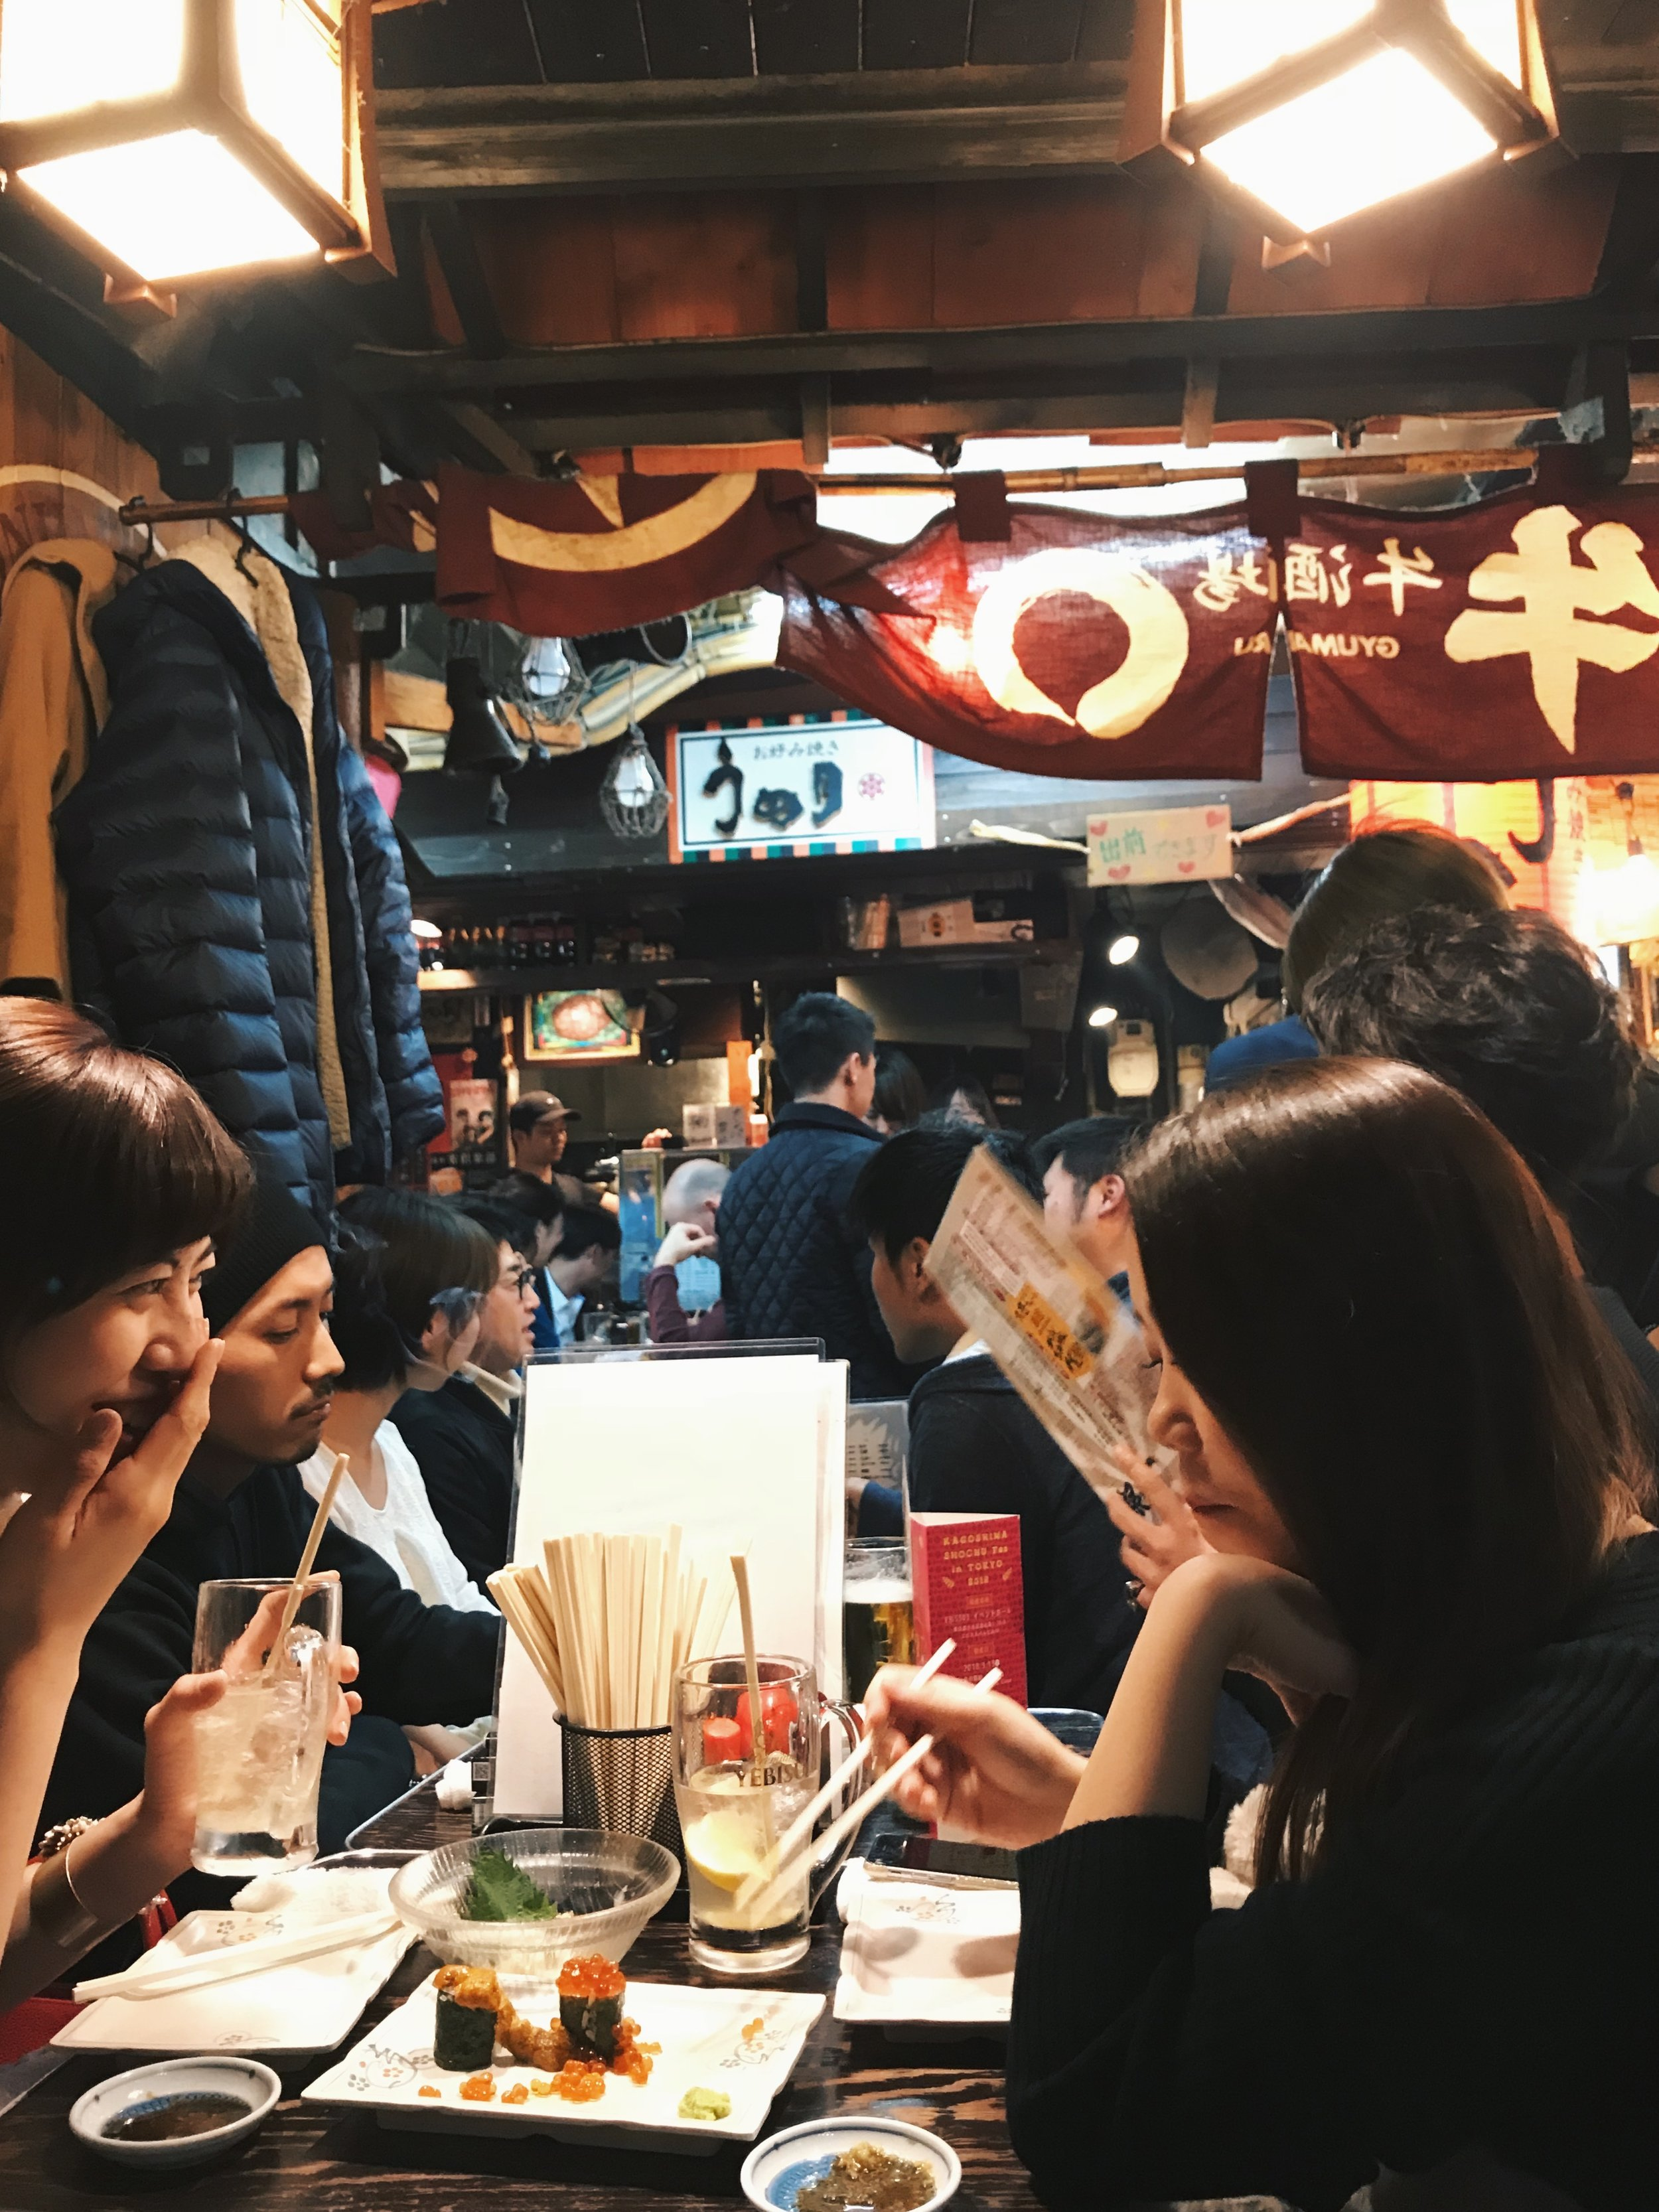 Cosy vibes at Ebisu Yokocho... more dreamy uni and roe goodness